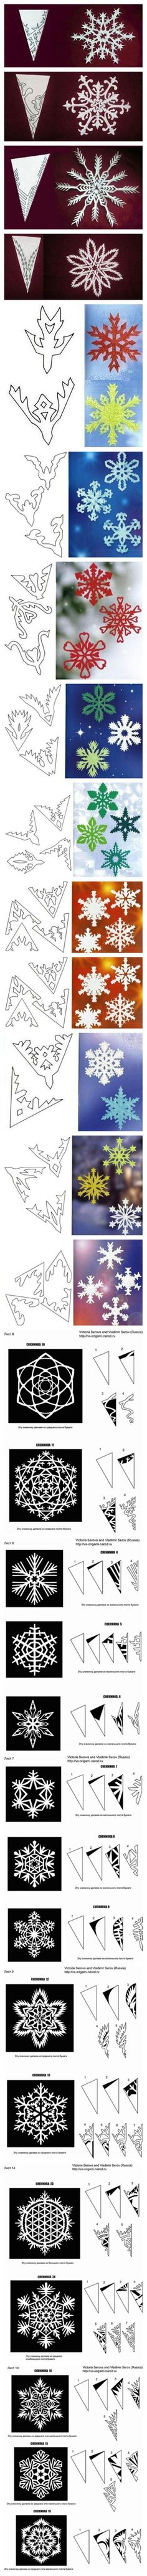 Paper snowflake patterns!!